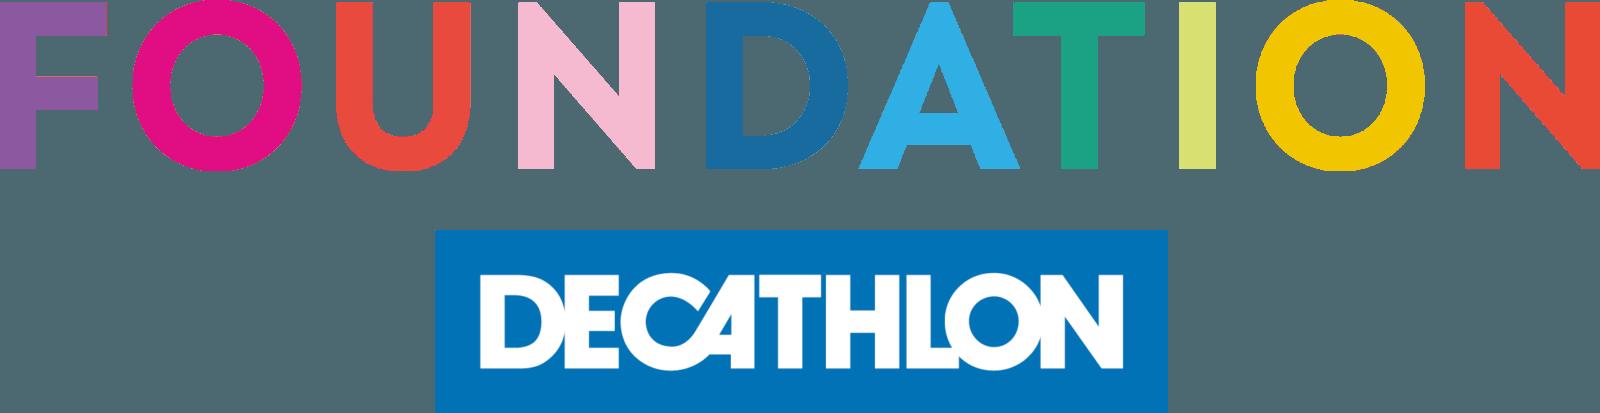 logo fondation decathlon